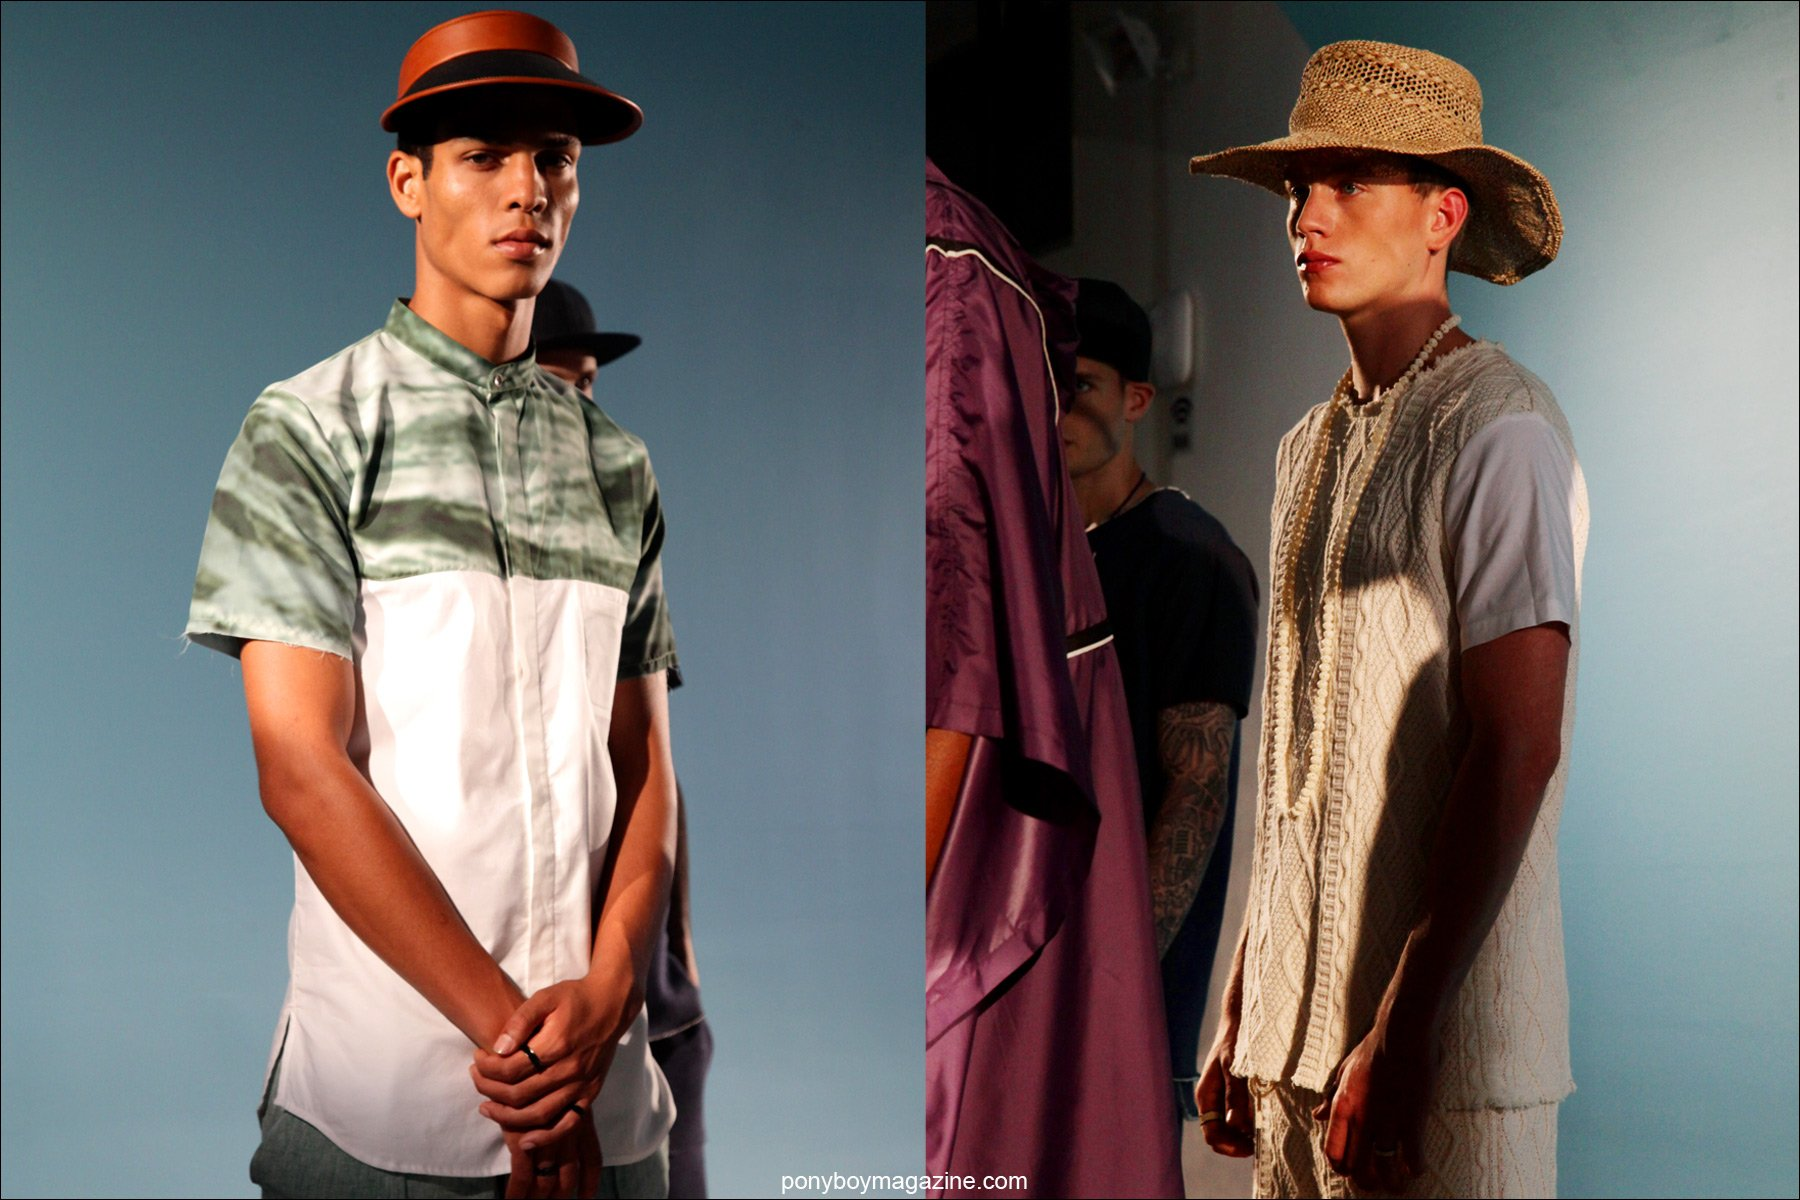 Models at Milk Studios for the Rochambeau Spring/Summer 2015 presentation. Imagess by Alexander Thompson for Ponyboy Magazine.